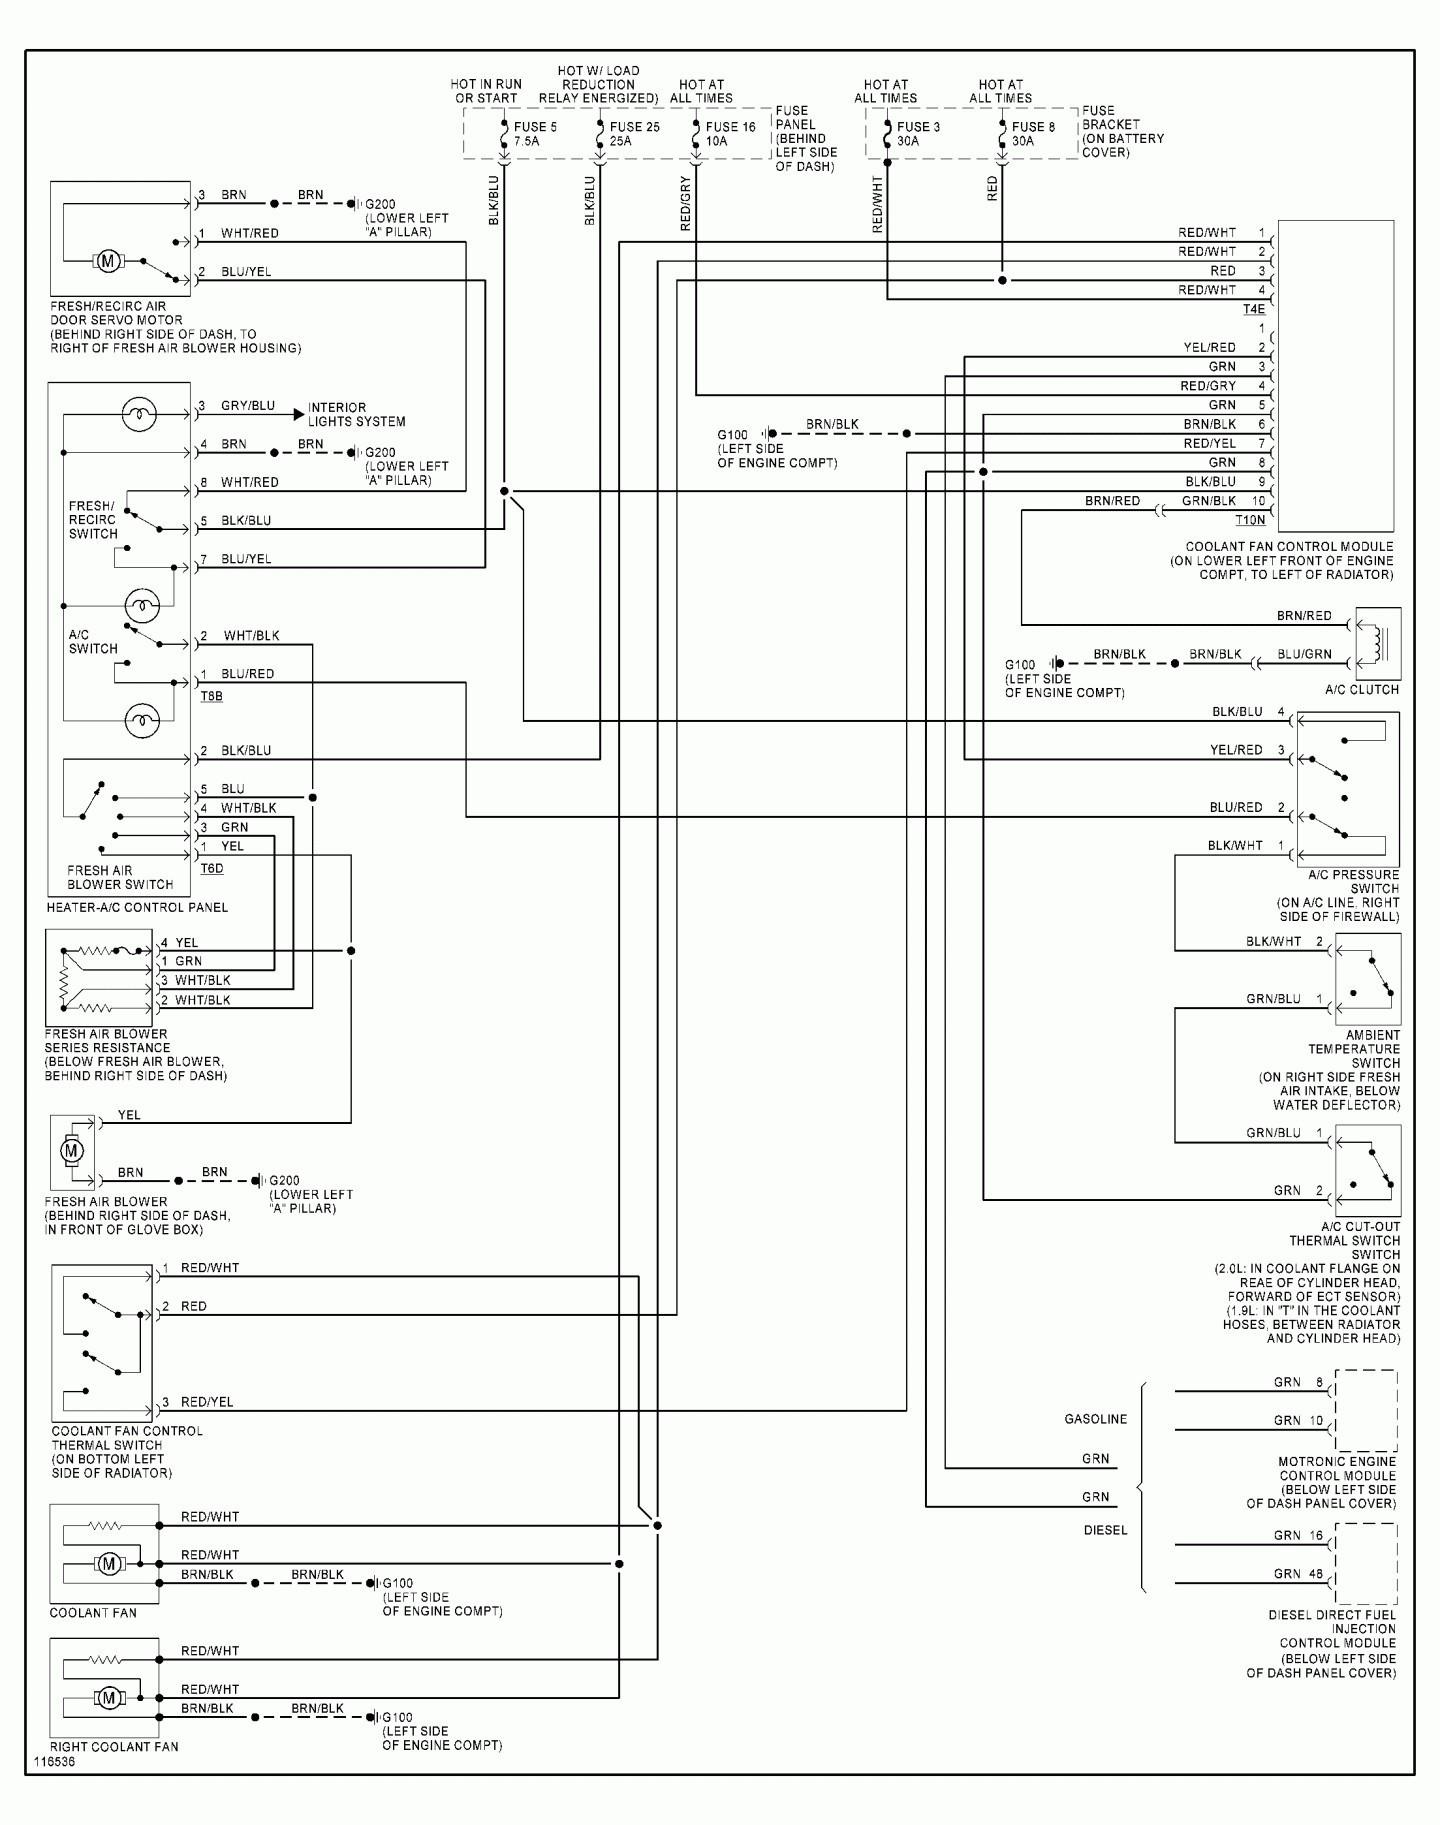 2011 Jetta Radio Wiring - Honda Fit Wiring Diagram Dimmer for Wiring Diagram  SchematicsWiring Diagram Schematics